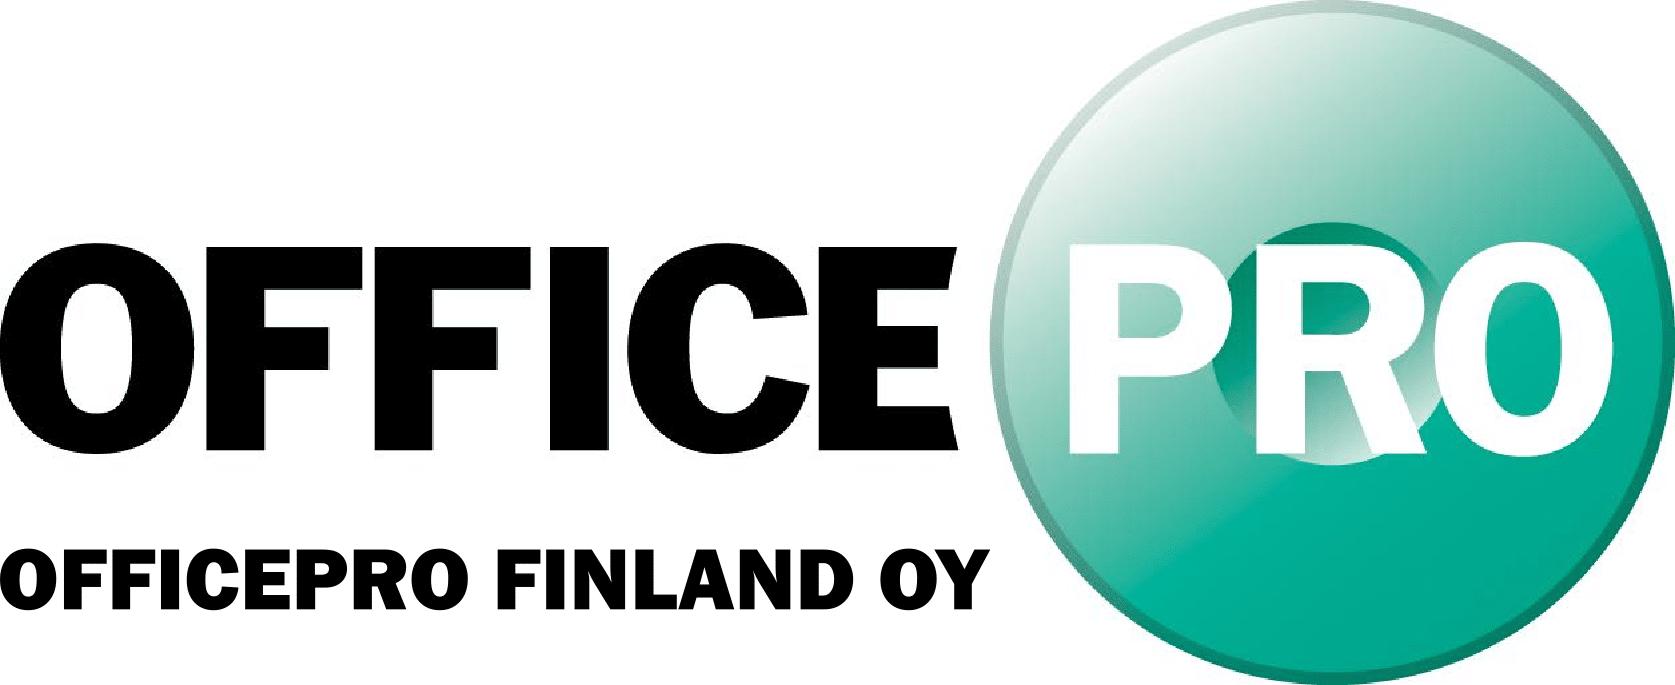 OfficePRO